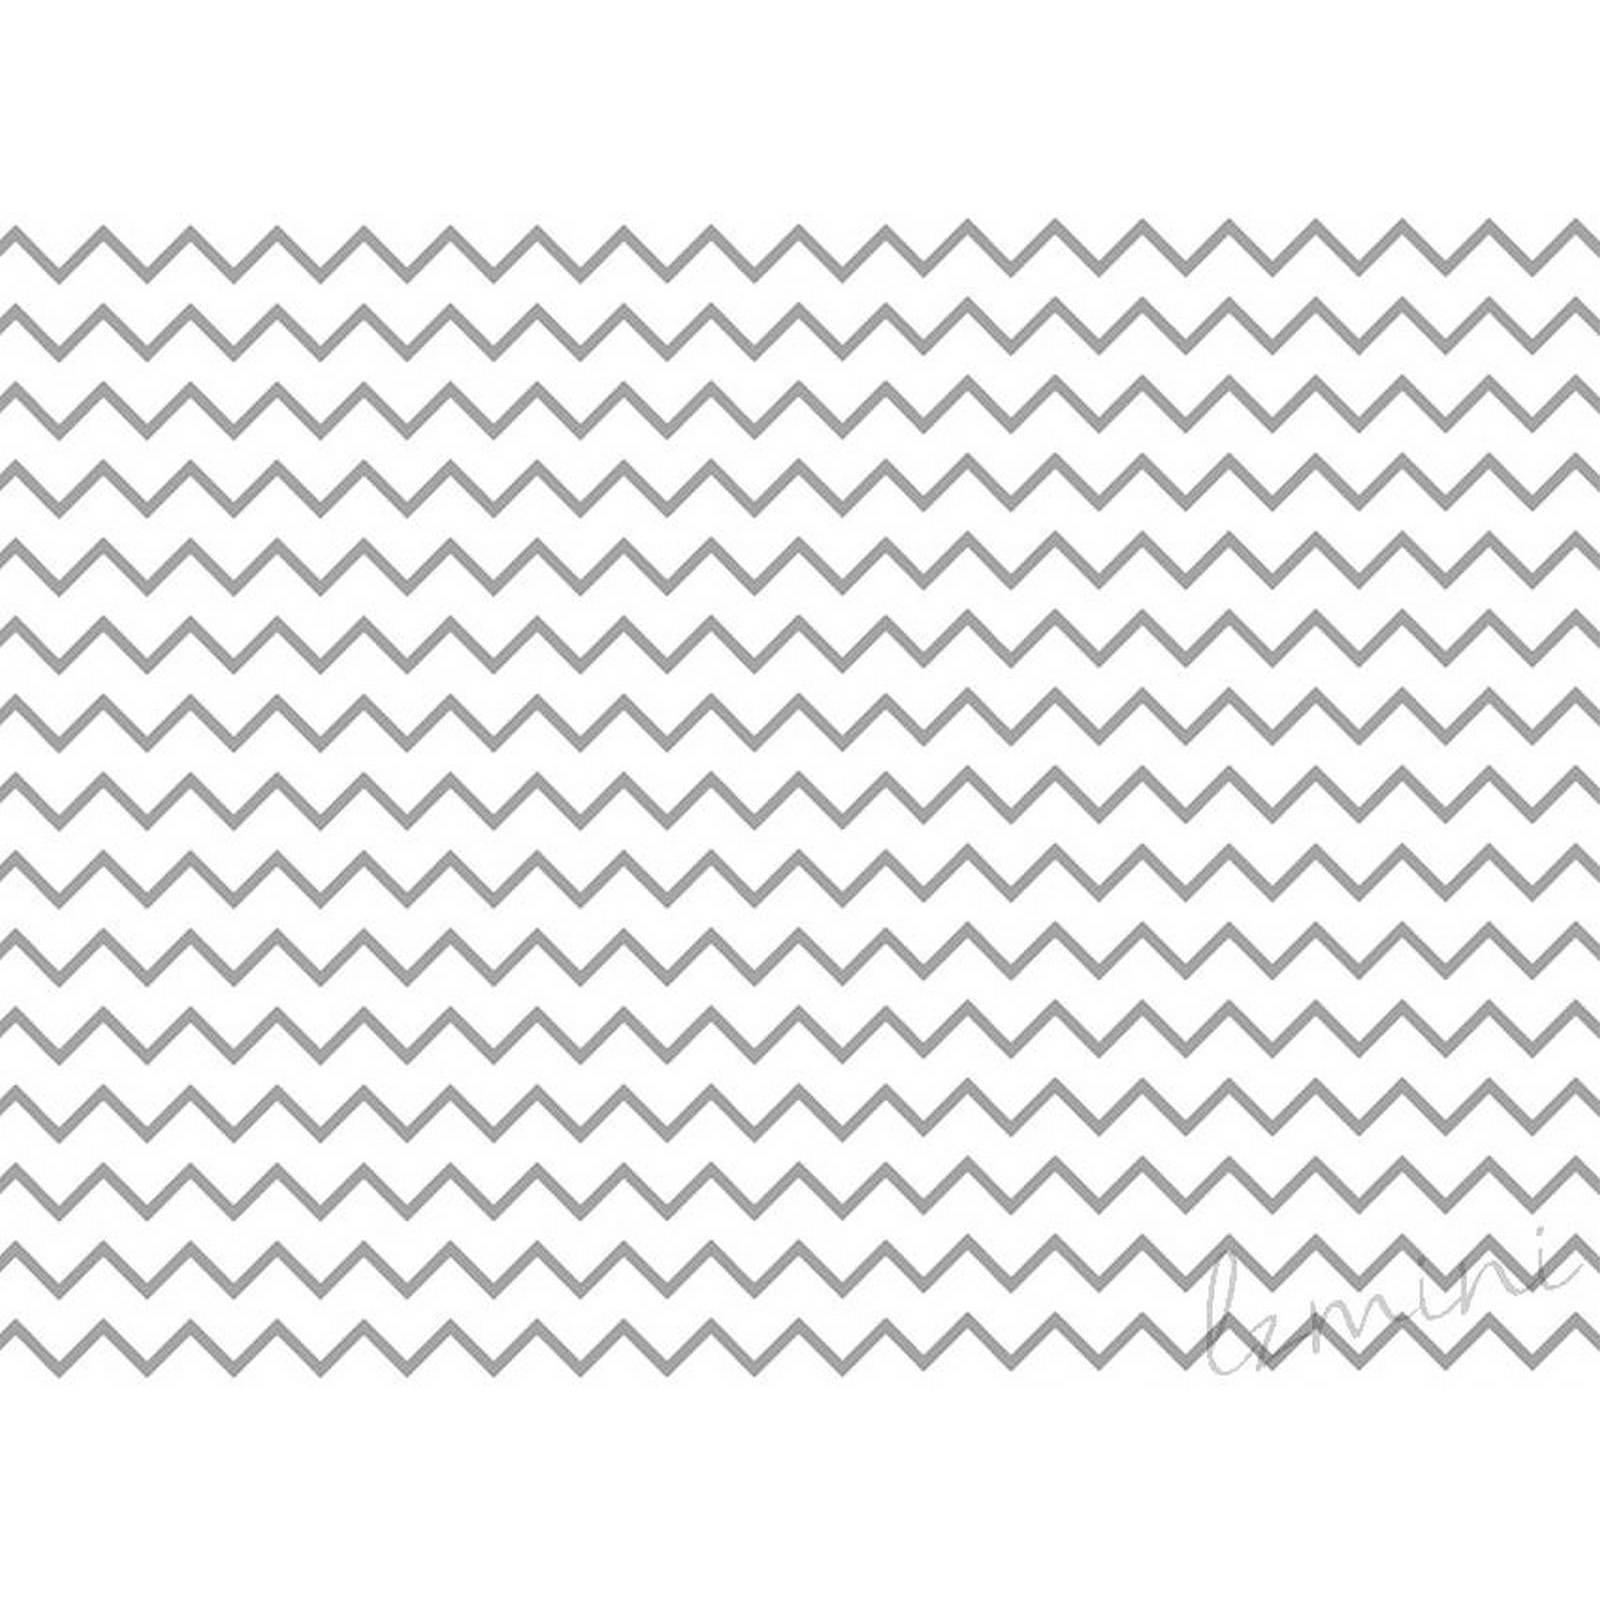 Papel de Parede Chev H=3m CINZA ESCURO Vinil Adesivo